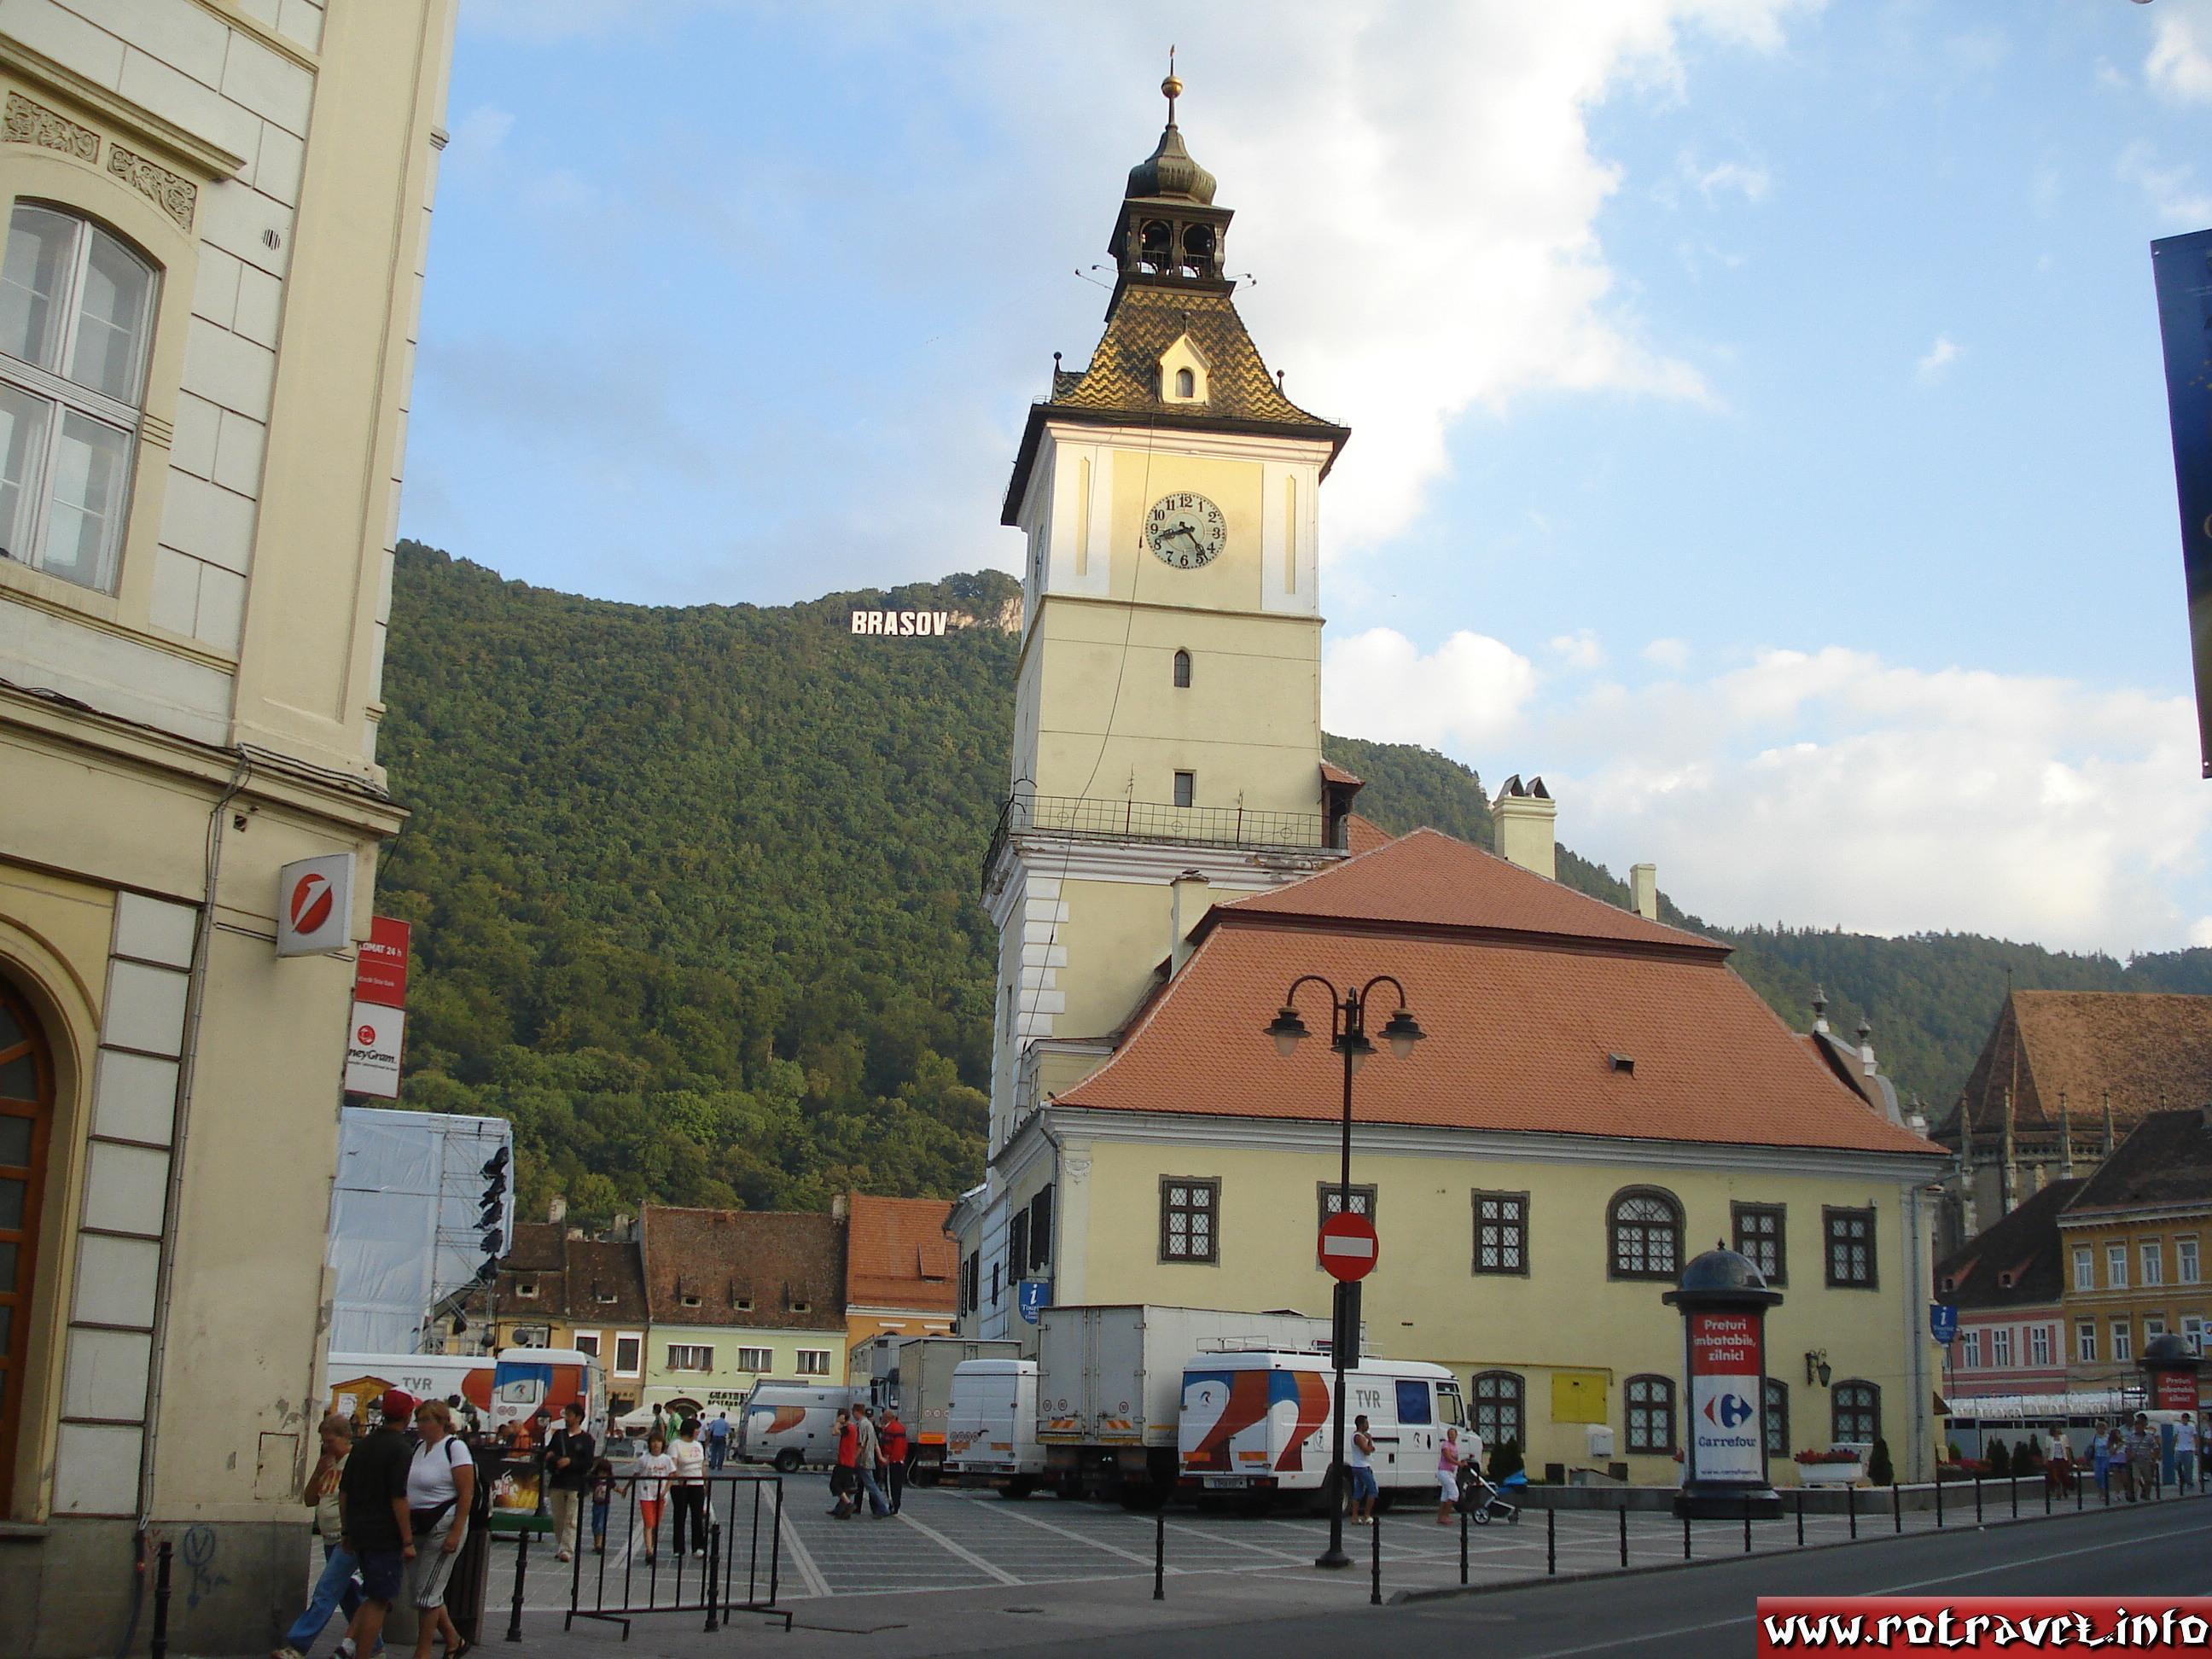 Council Square (Piaţa Sfatului) where Golden Stag (Cerbul de Aur) festival will take place